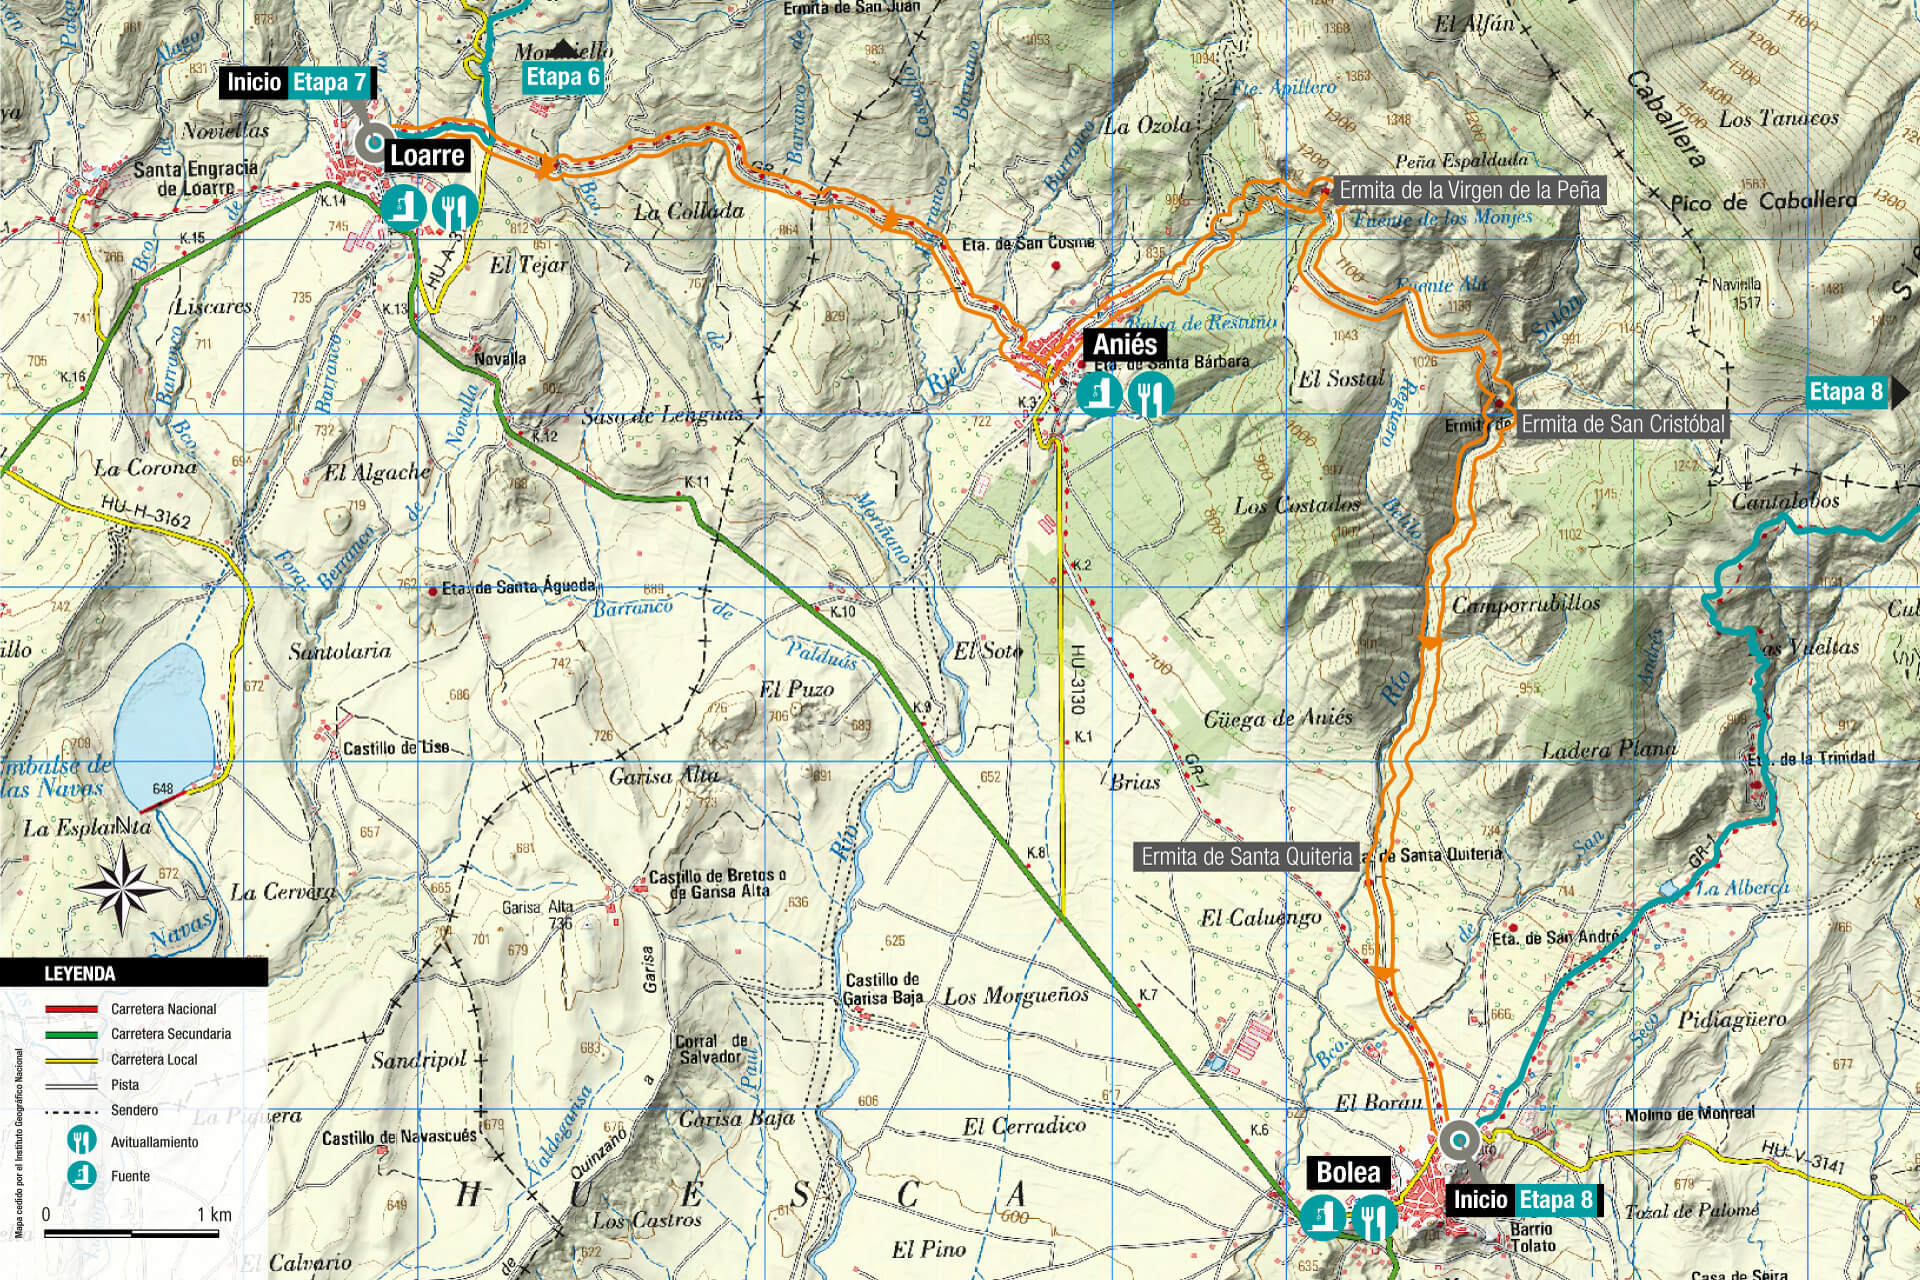 Rutas outdoor de trekking bike trail running cultural y - Casa rufino bolea ...